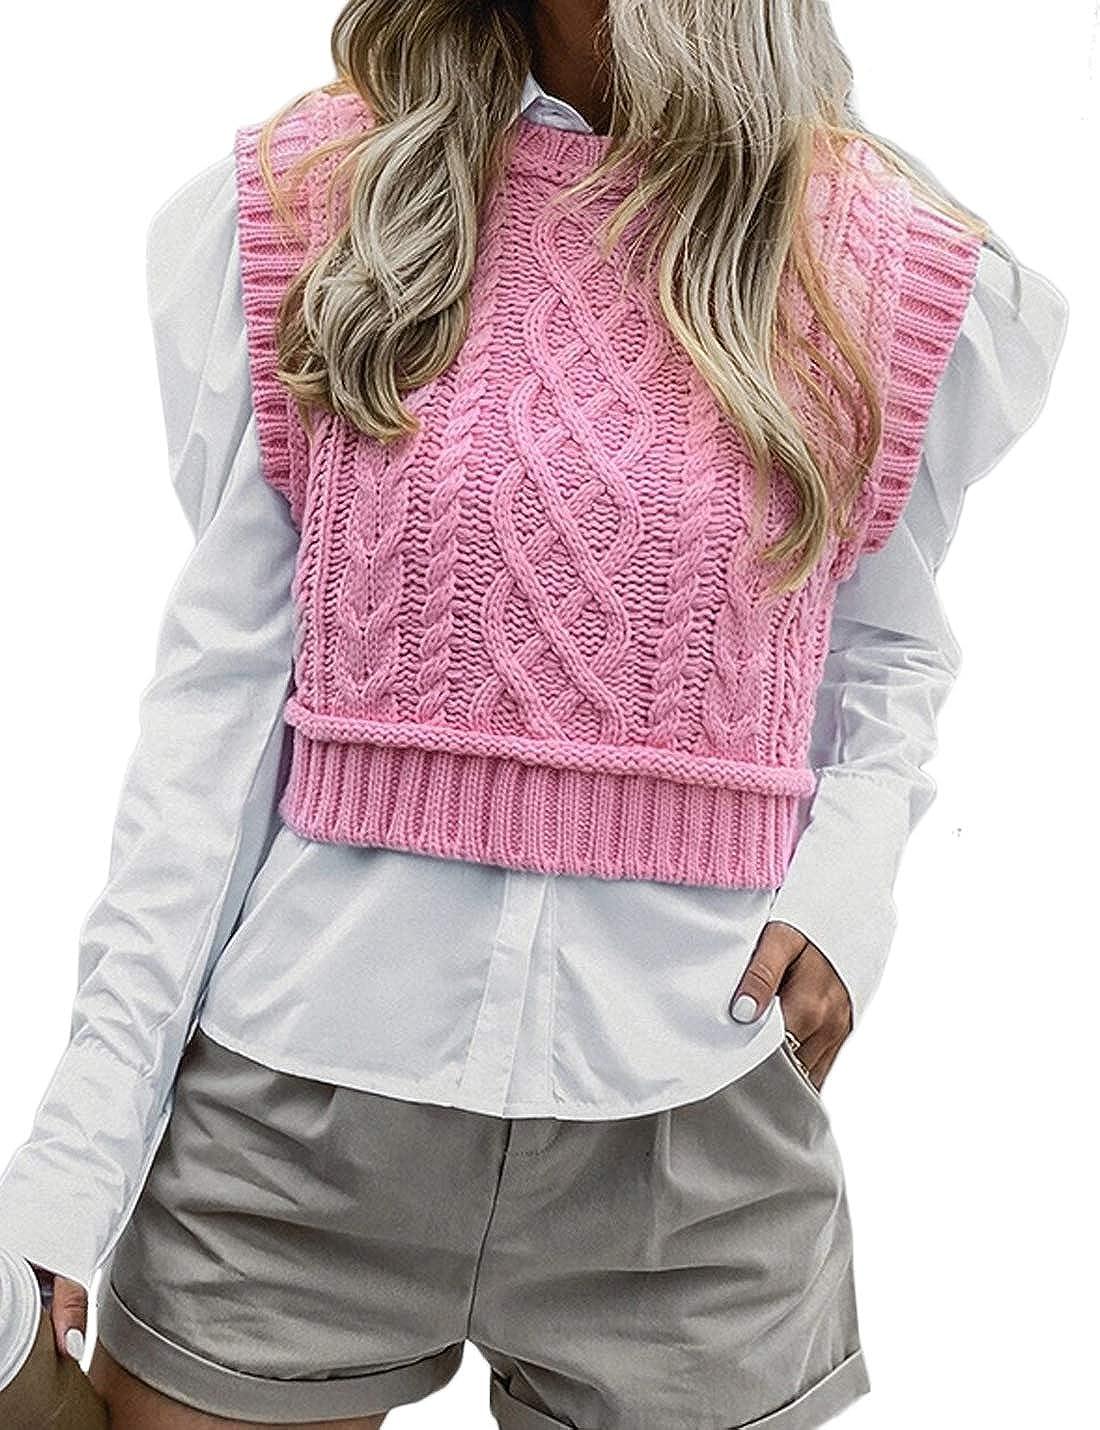 Jenkoon Women's Stylish Crew Neck Cable Knit Sweater Vest Crop Girl Knitwear Sweater Tops